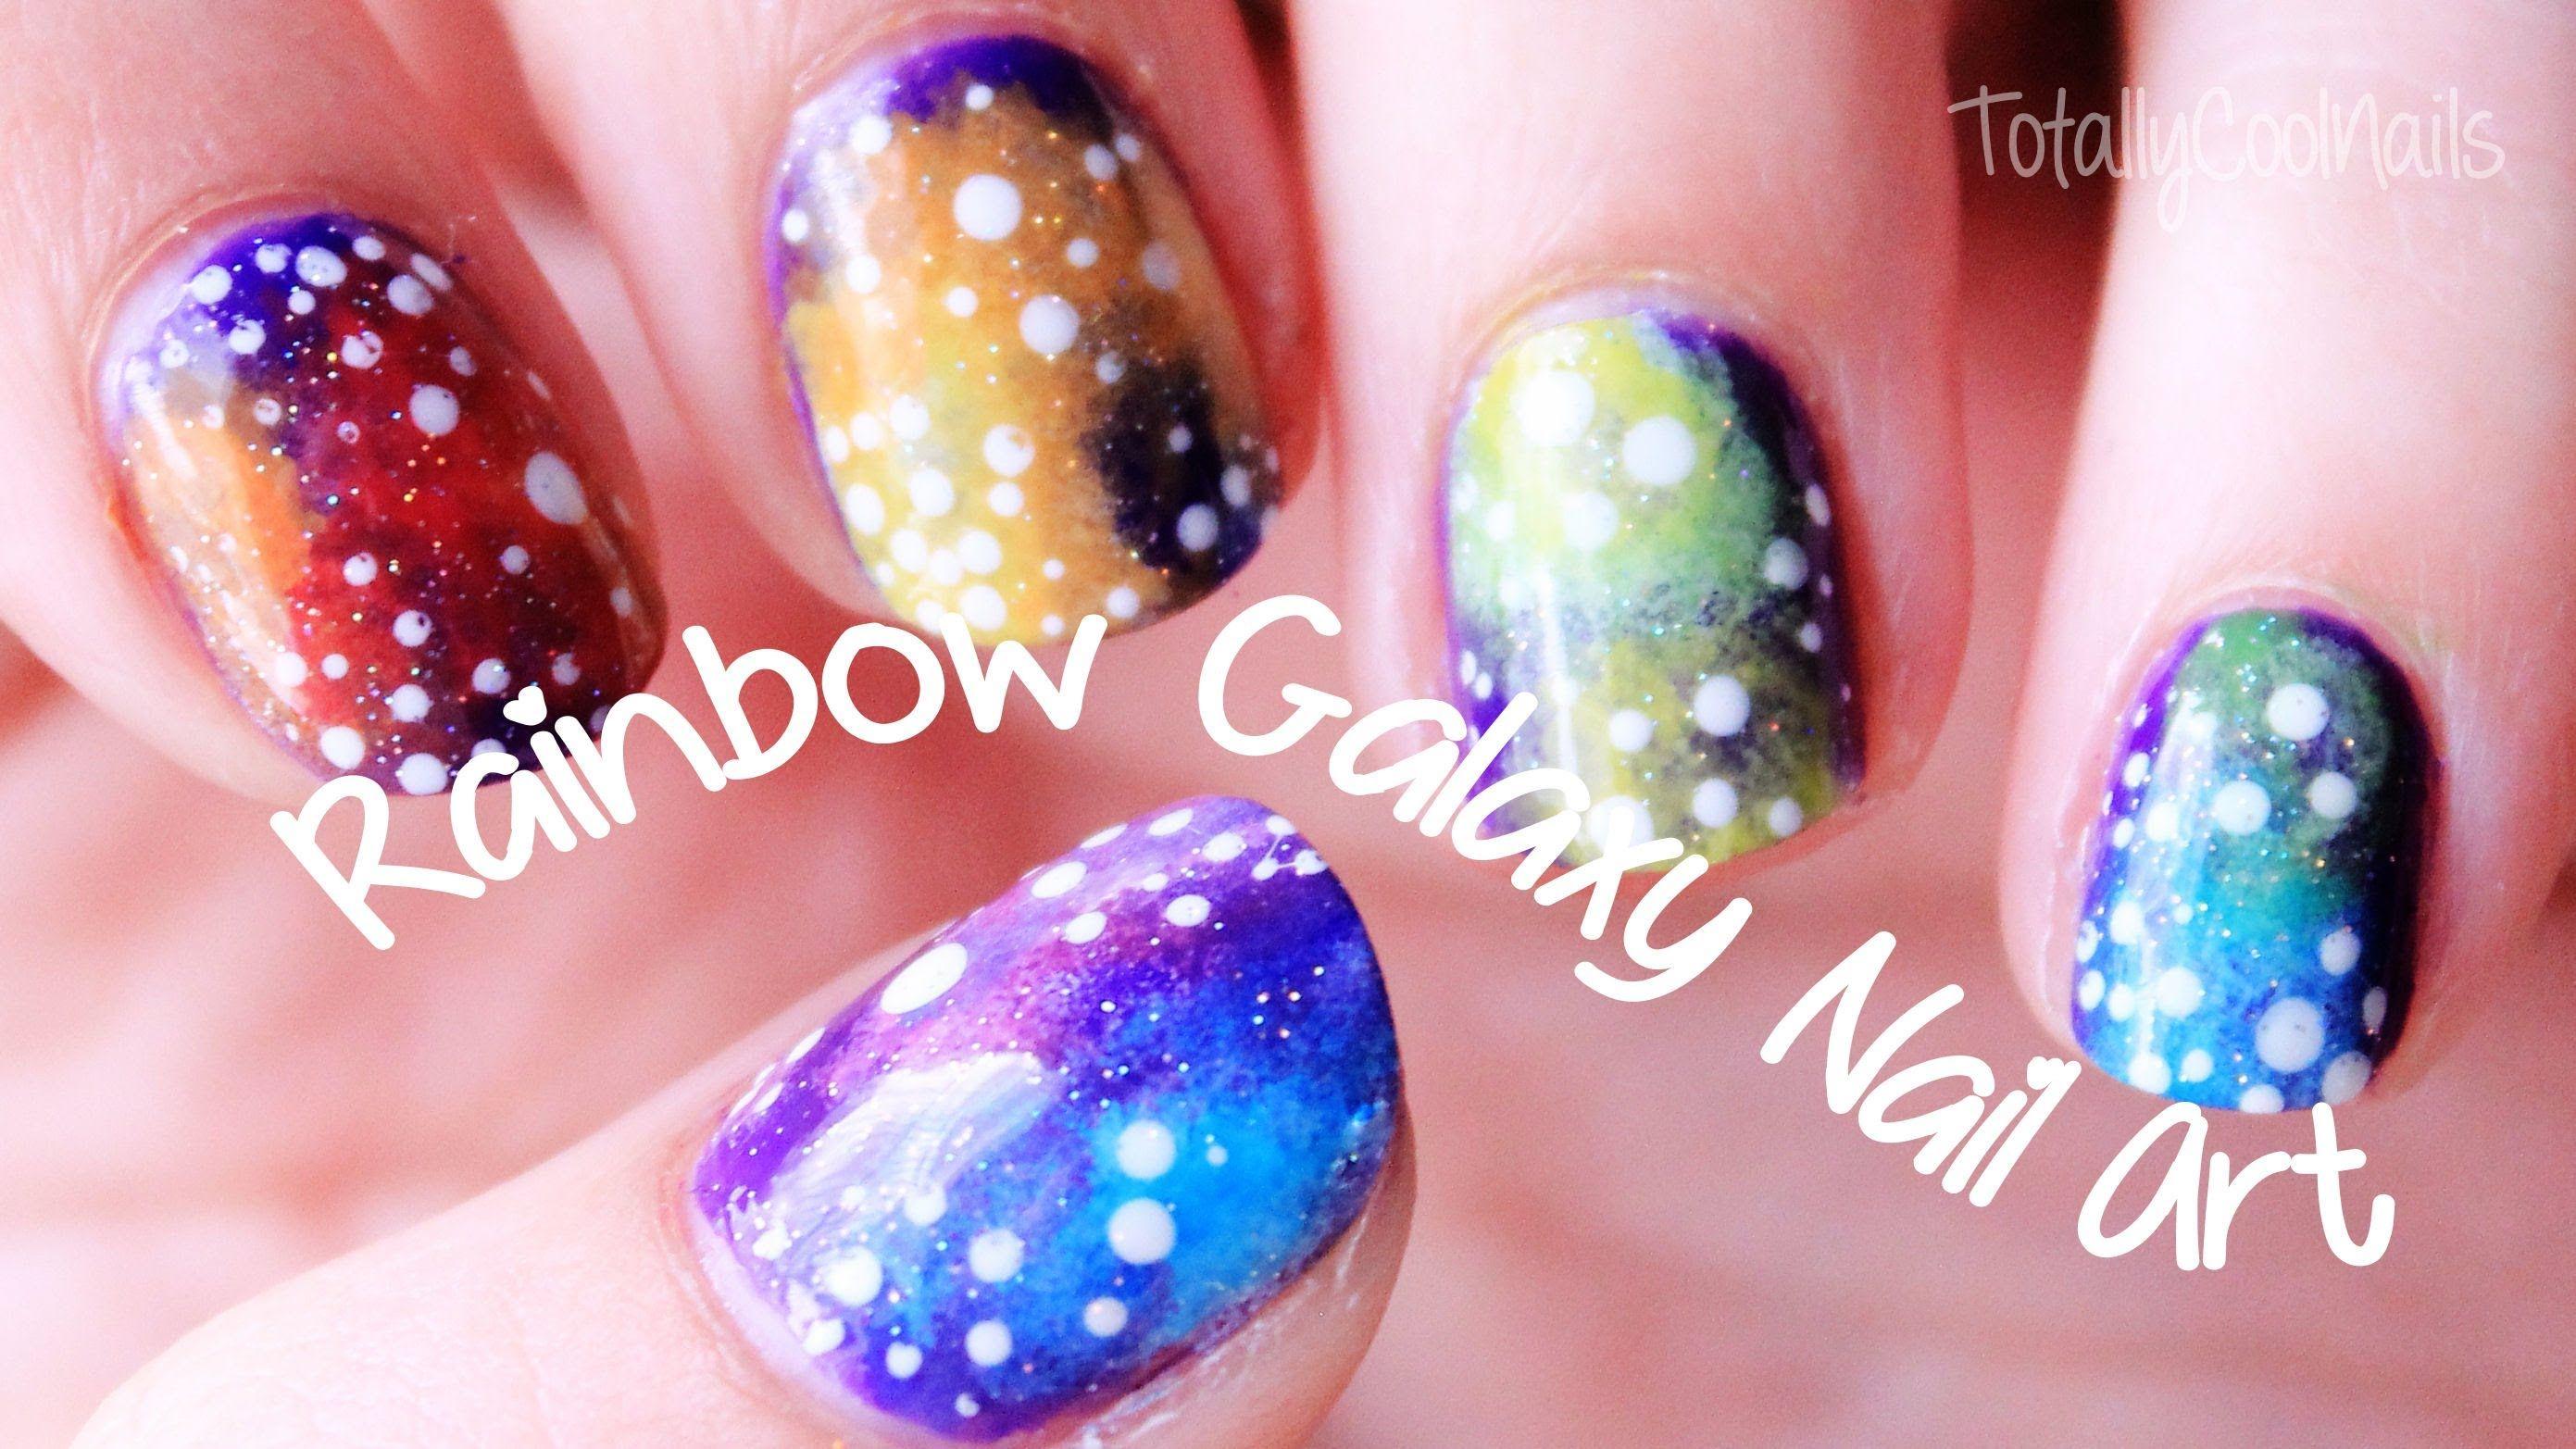 Rainbow Galaxy Nail Art | TotallyCoolNails | Too cute | Pinterest ...